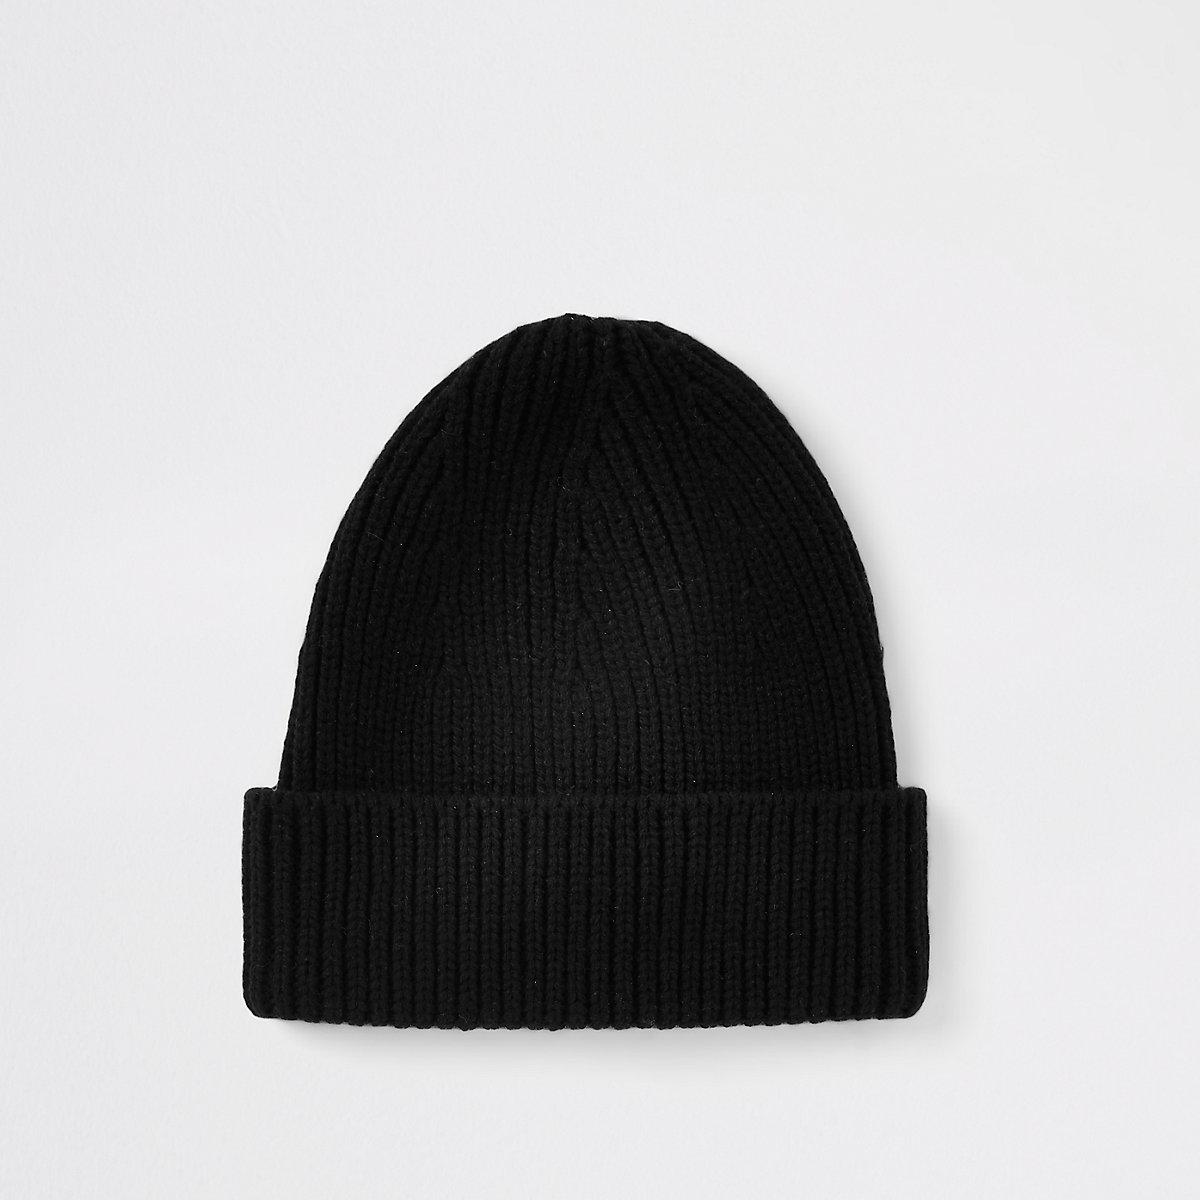 Black knit fisherman beanie hat